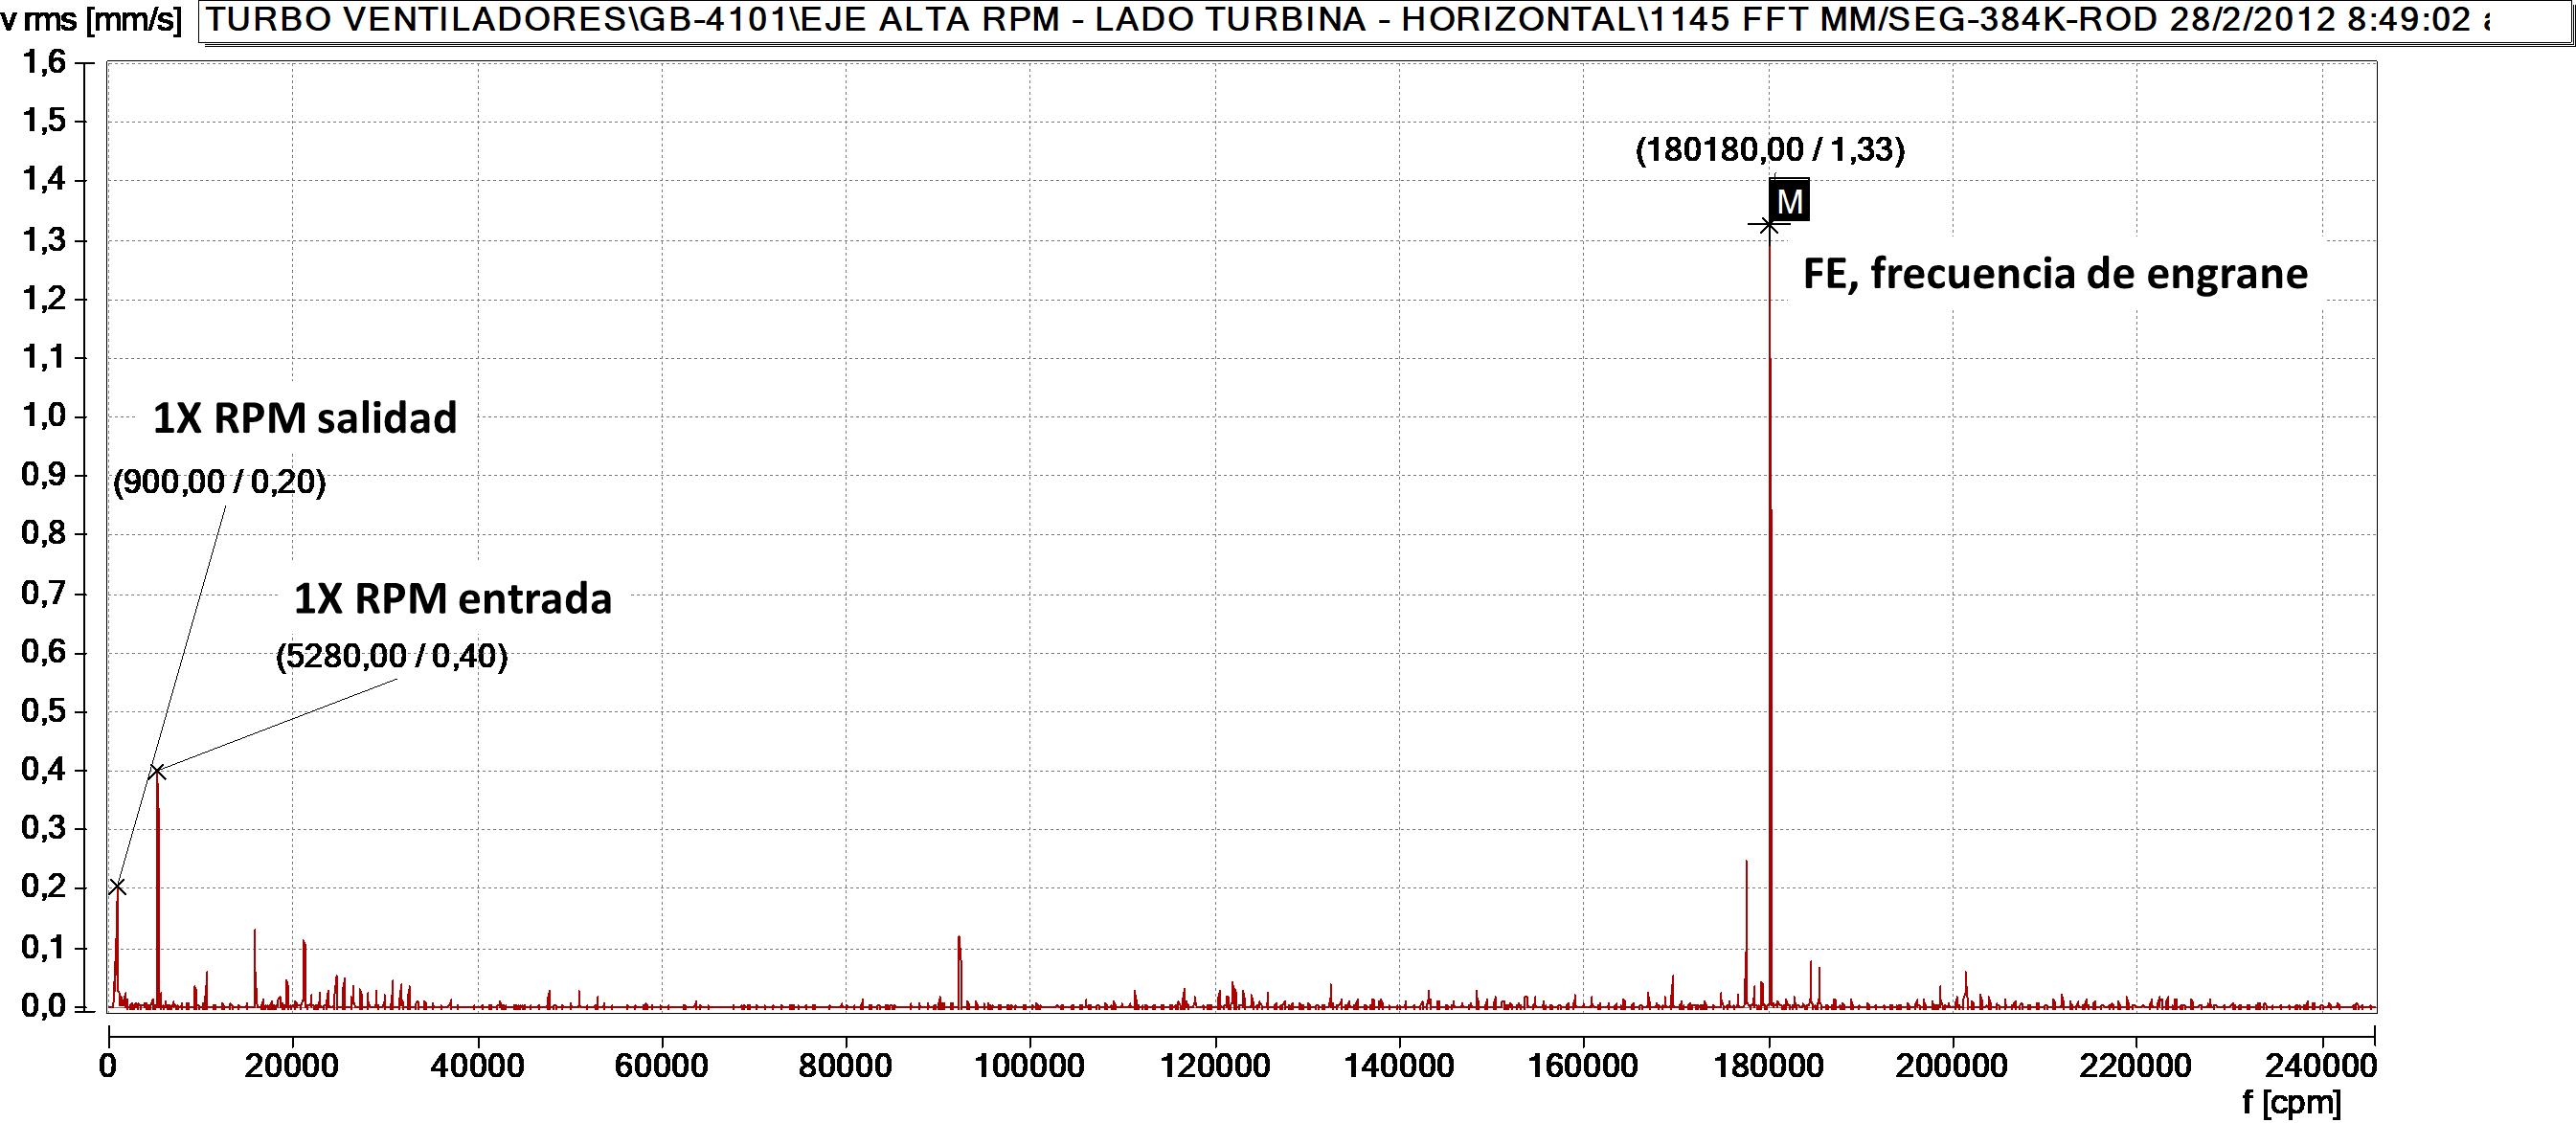 Figure 7. Gearbox vibration frequency spectrum baseline